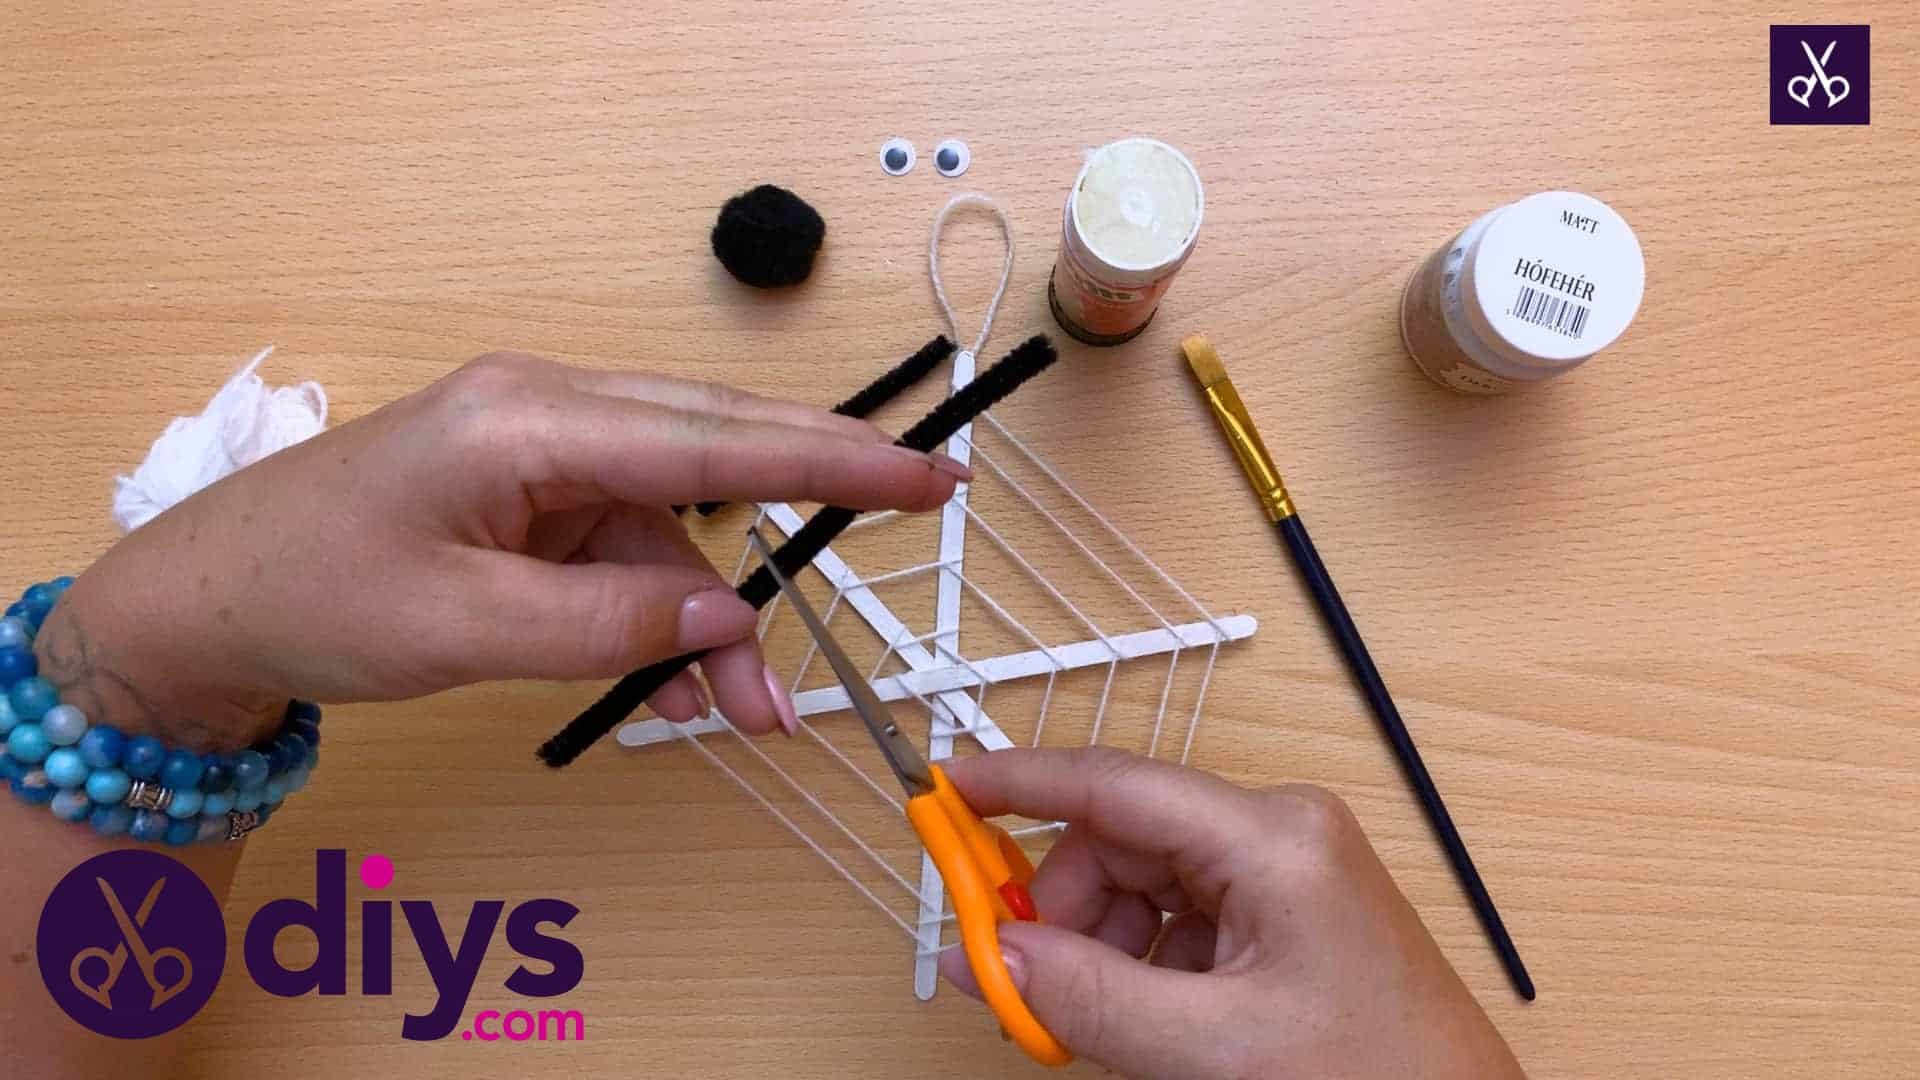 Diy spider web decoration for halloween yarn